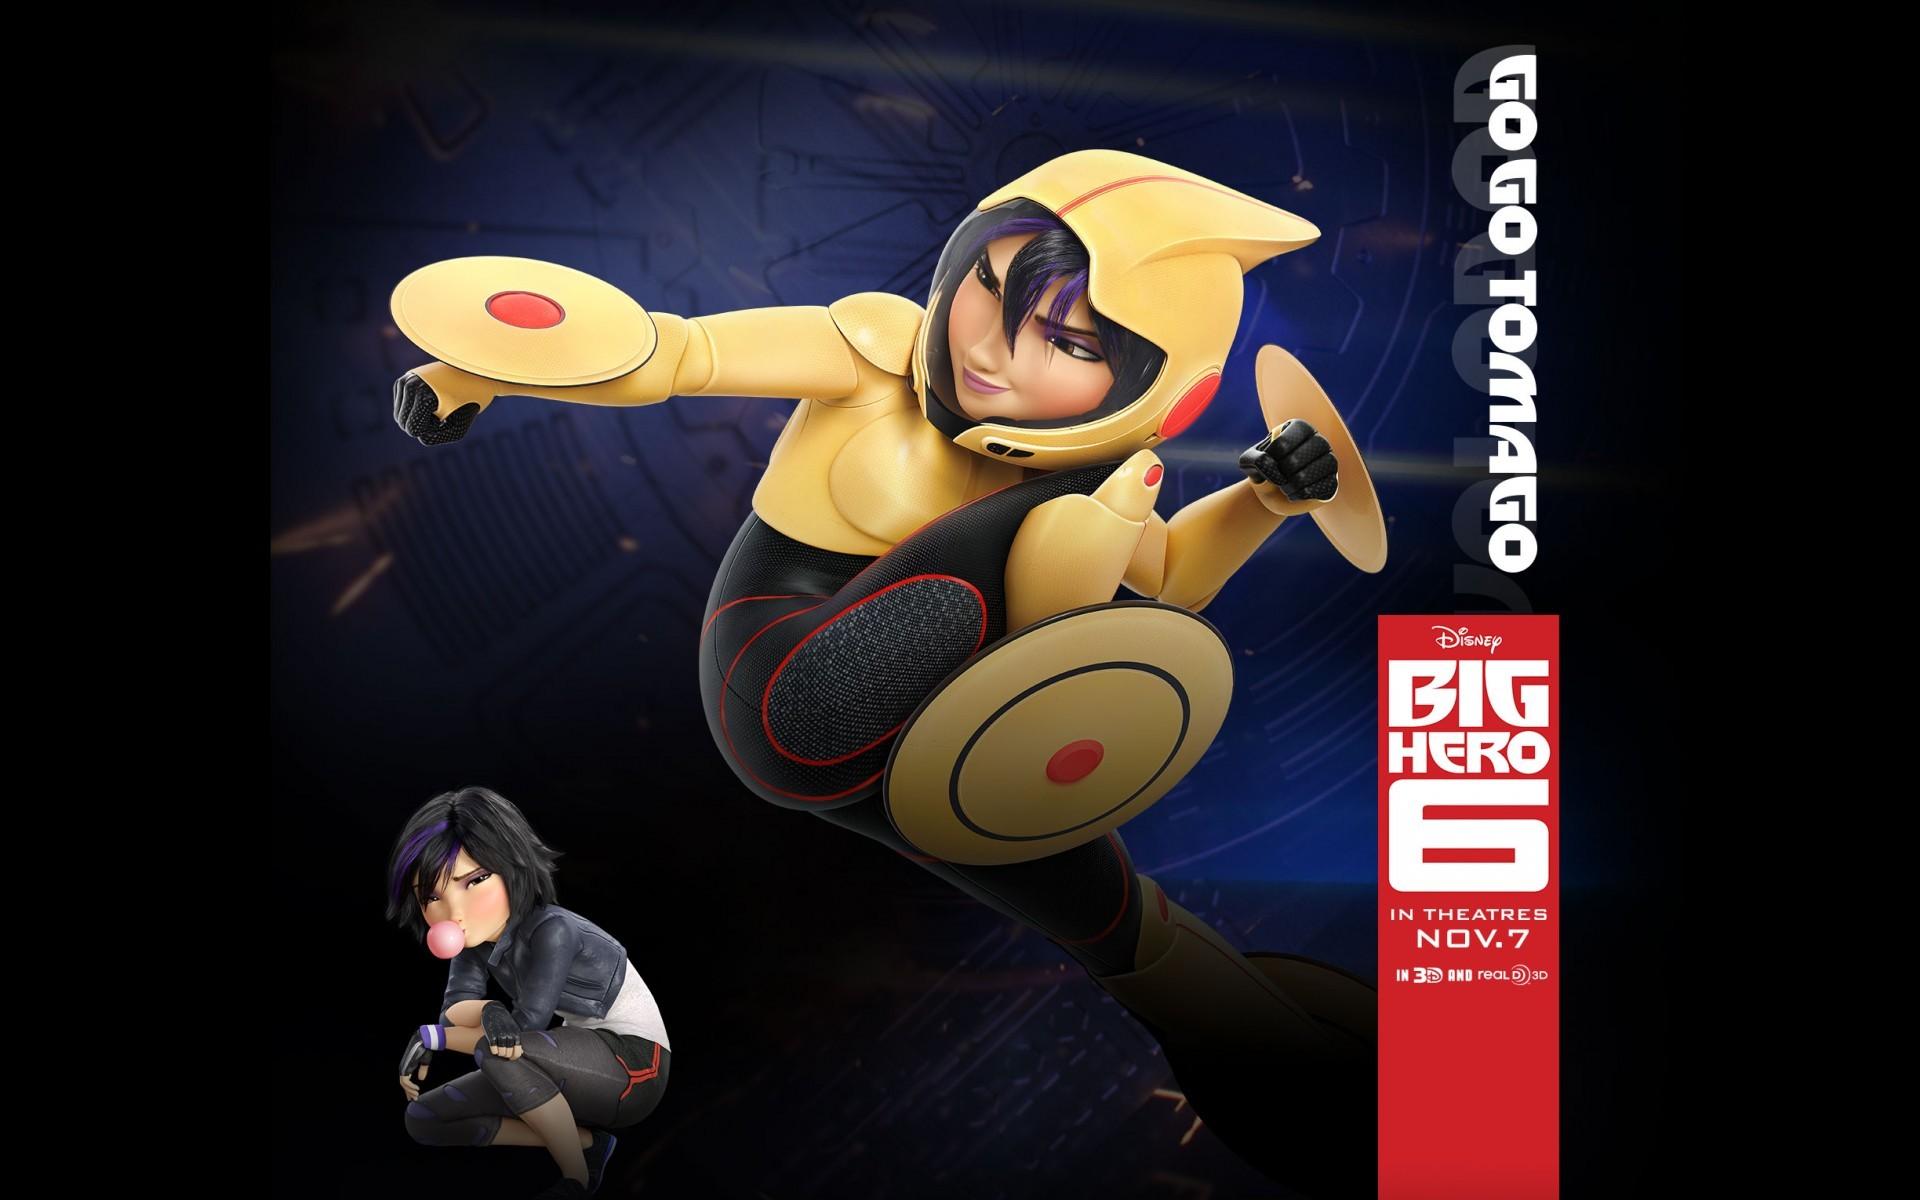 Baymax And Gogo wallpaper : cartoon, superhero, walt disney, big hero 6